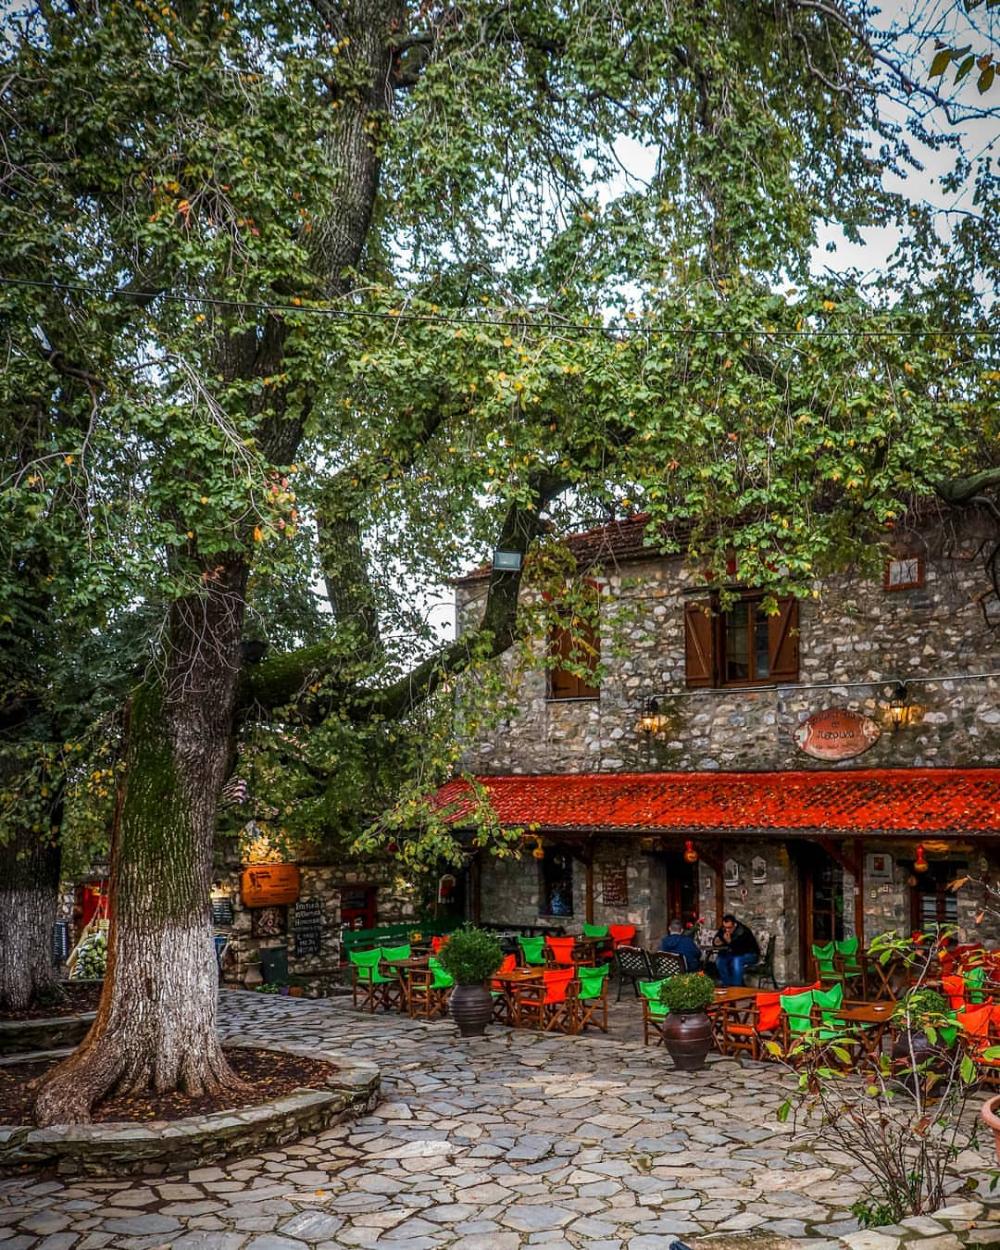 #travel #volos_photographers #great_captures_greece #instago - @kostasnaoum Κωστας Ναουμ media photos videos